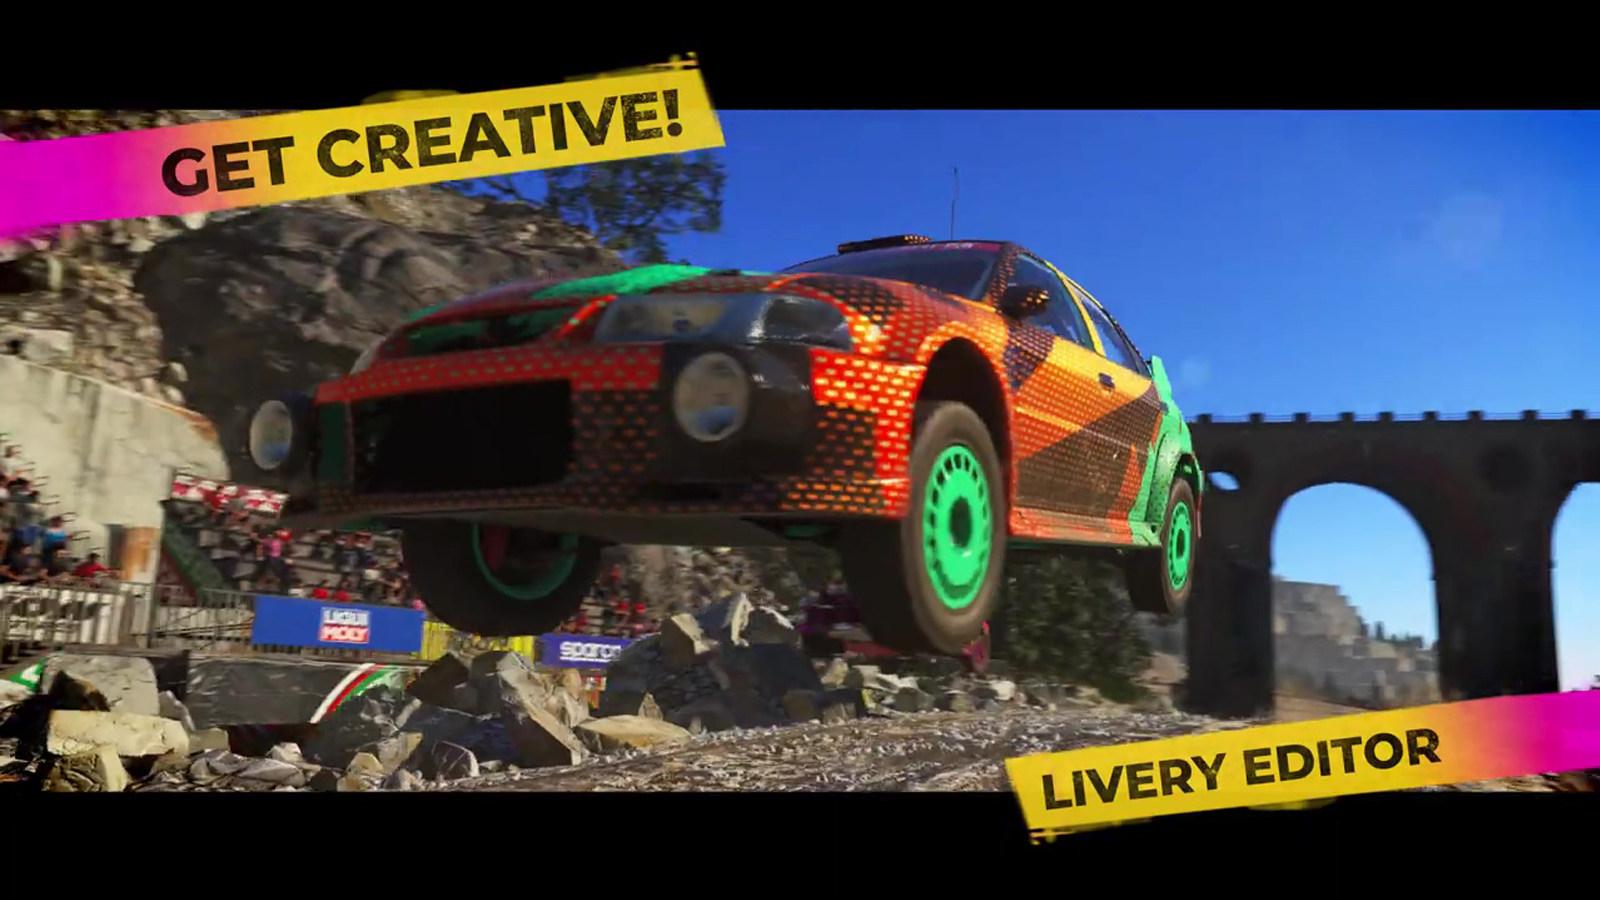 《DIRT 5》发布全新预告片,展示游戏多项功能与模式